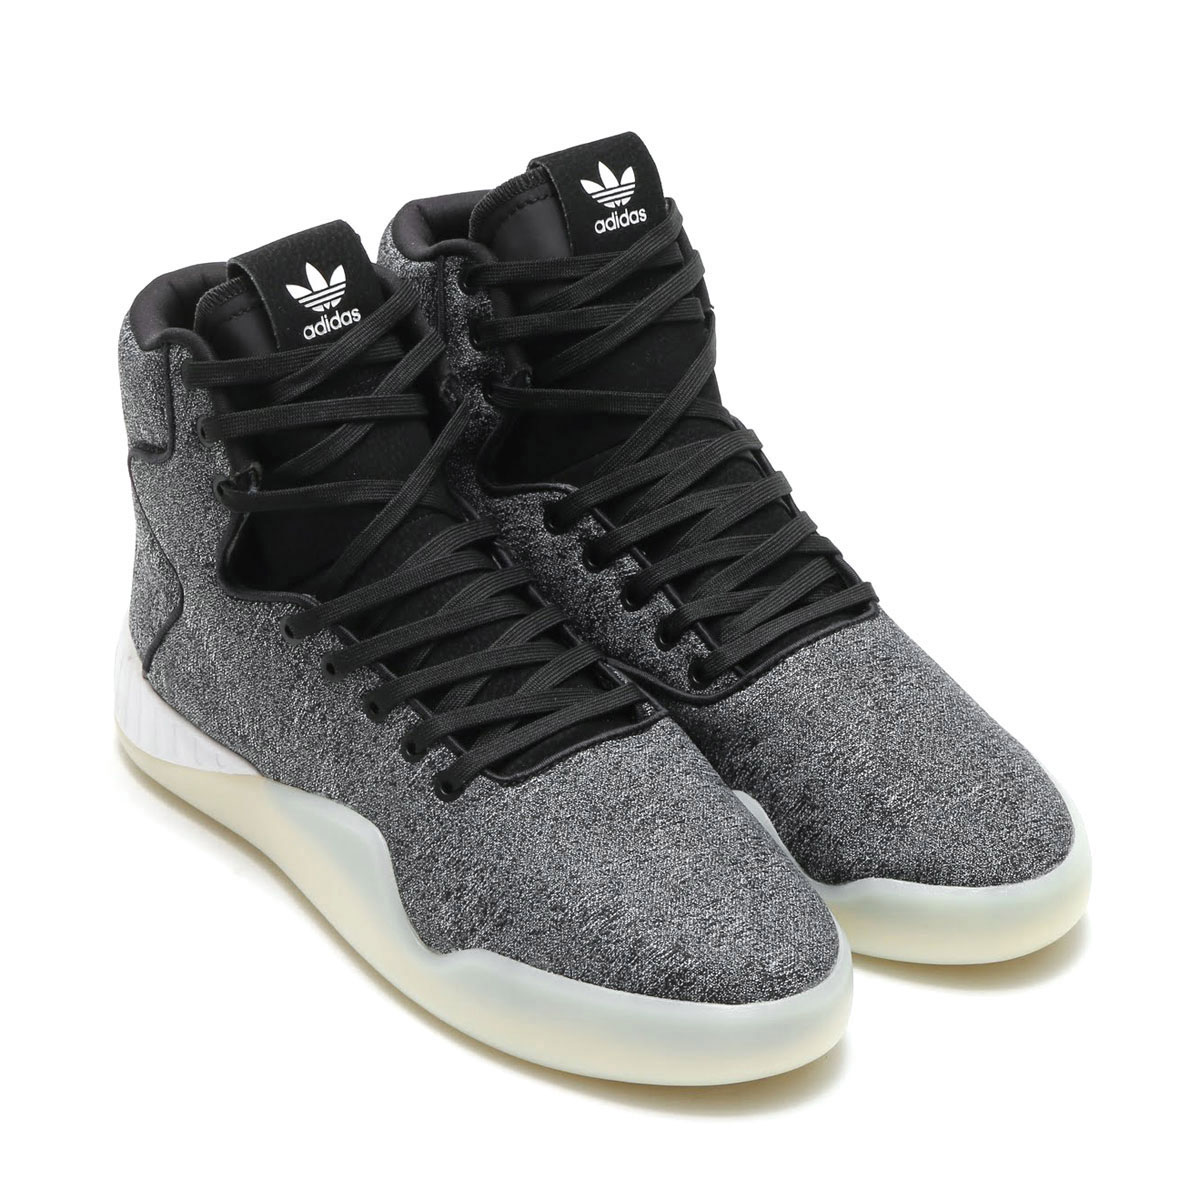 adidas Originals TUBULAR ISTNT JC(アディダス オリジナルス チューブラー インスティンクト JC)CORE BLACK/CRYSTAL WHITE/RUNNING WHITE【メンズ スニーカー】17SS-I